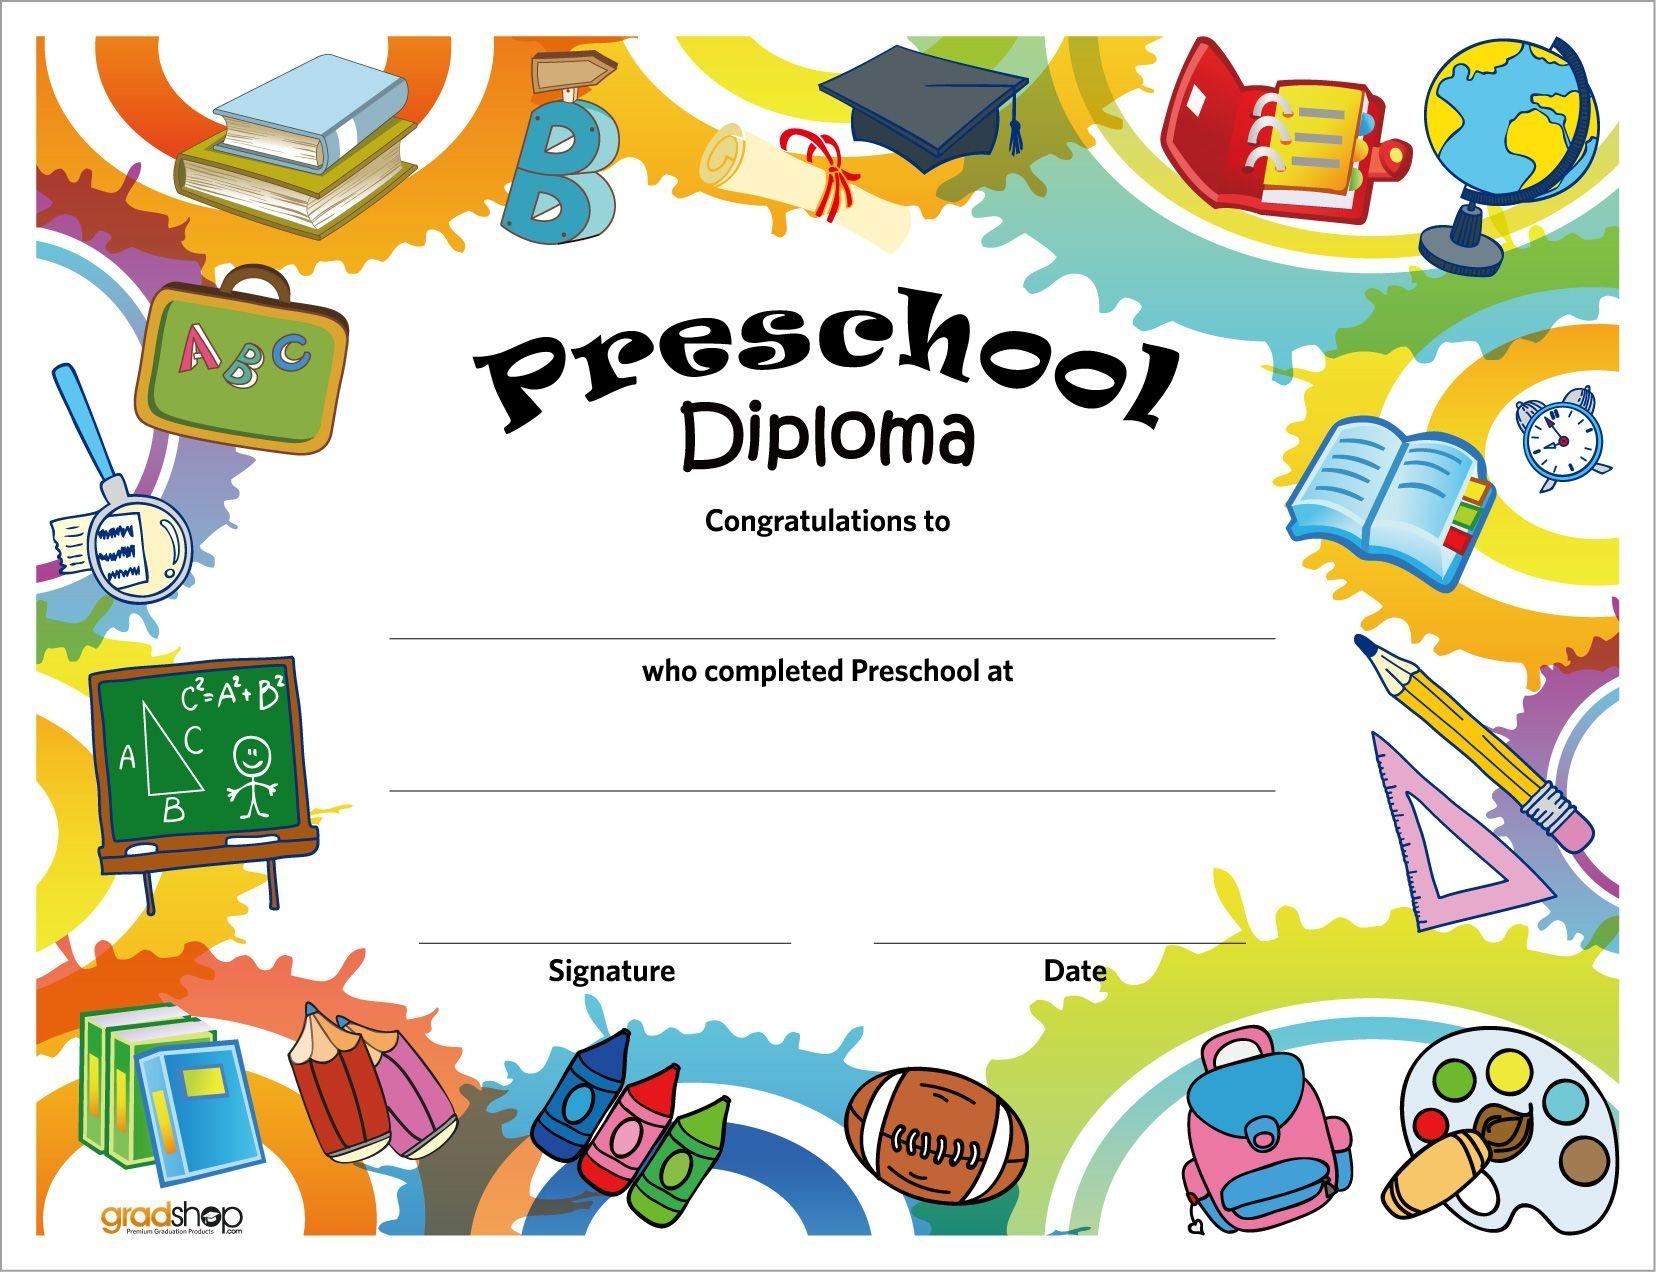 Free Printable Preschool Diplomas | Preschool Classroom | Graduation - Preschool Graduation Diploma Free Printable